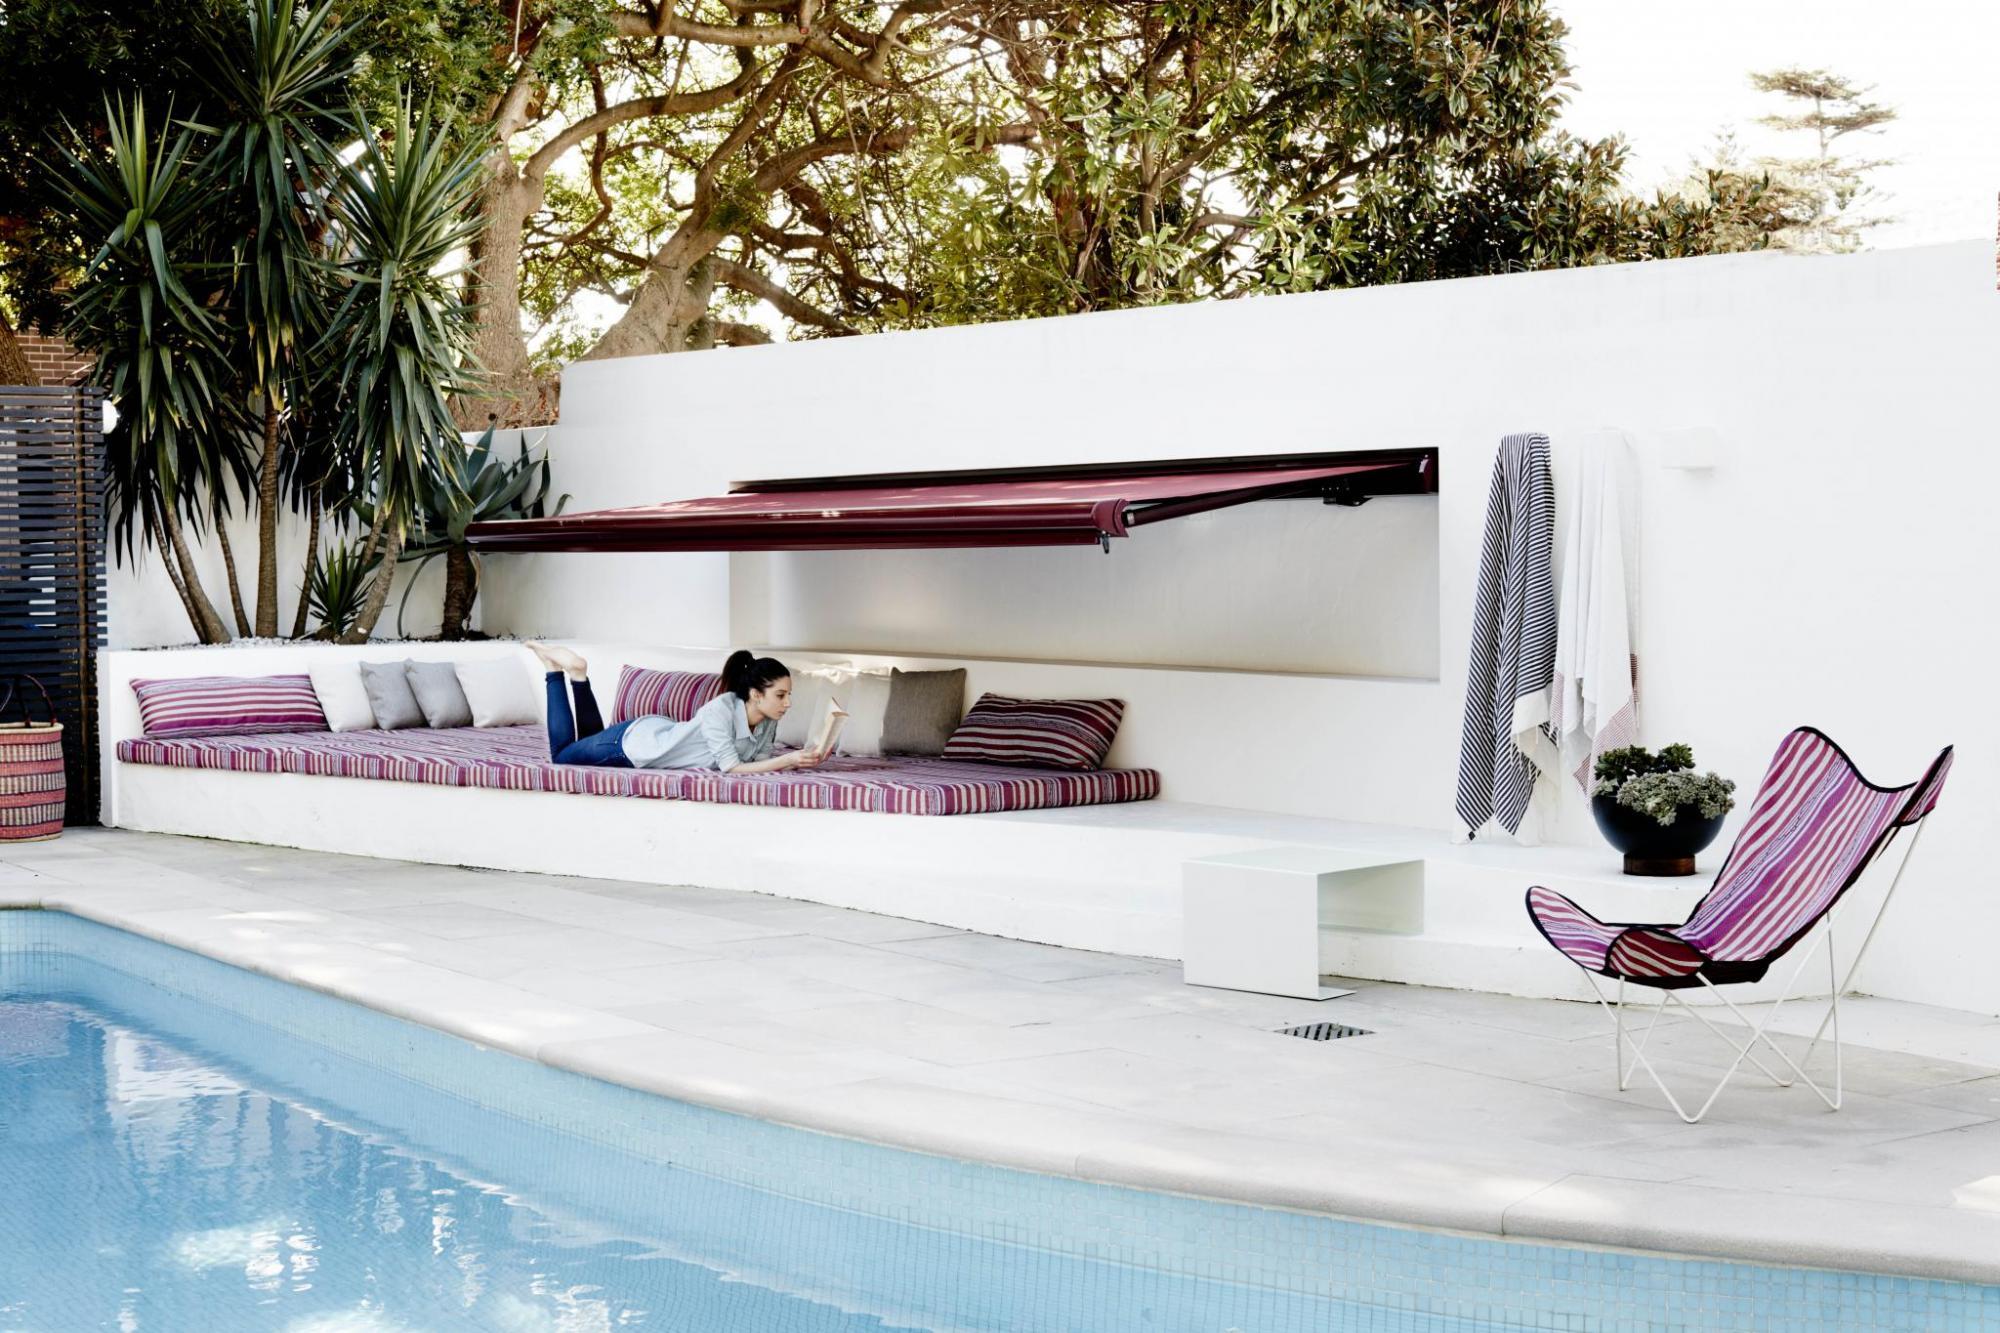 Interior Design & Landscape Architecture by Amber Road - Sydney, NSW